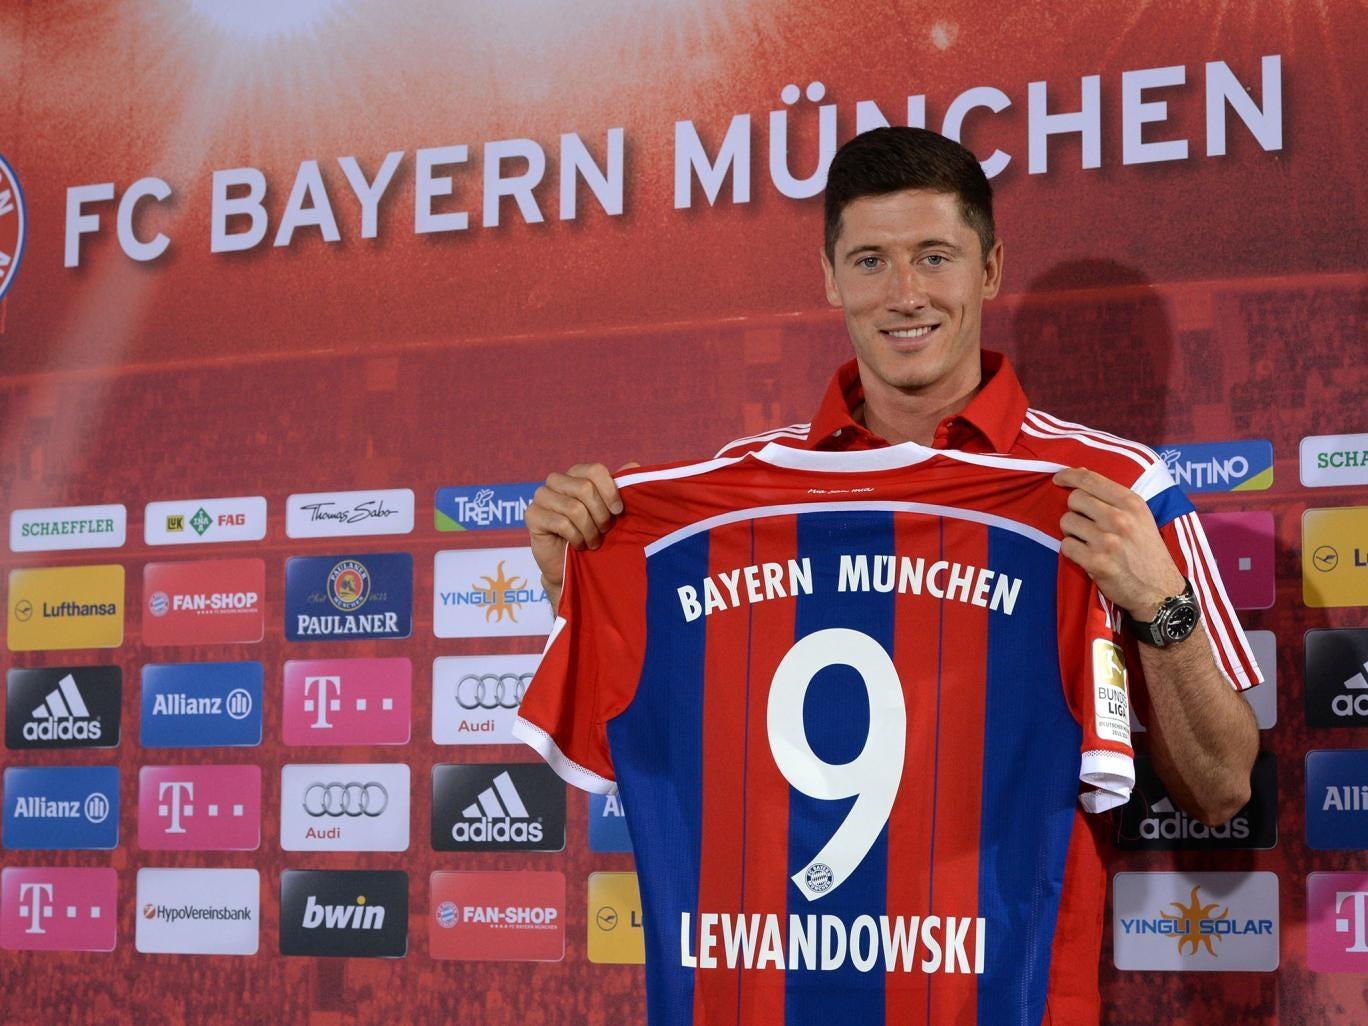 Robert Lewandowski has been unveiled at Bayern Munich